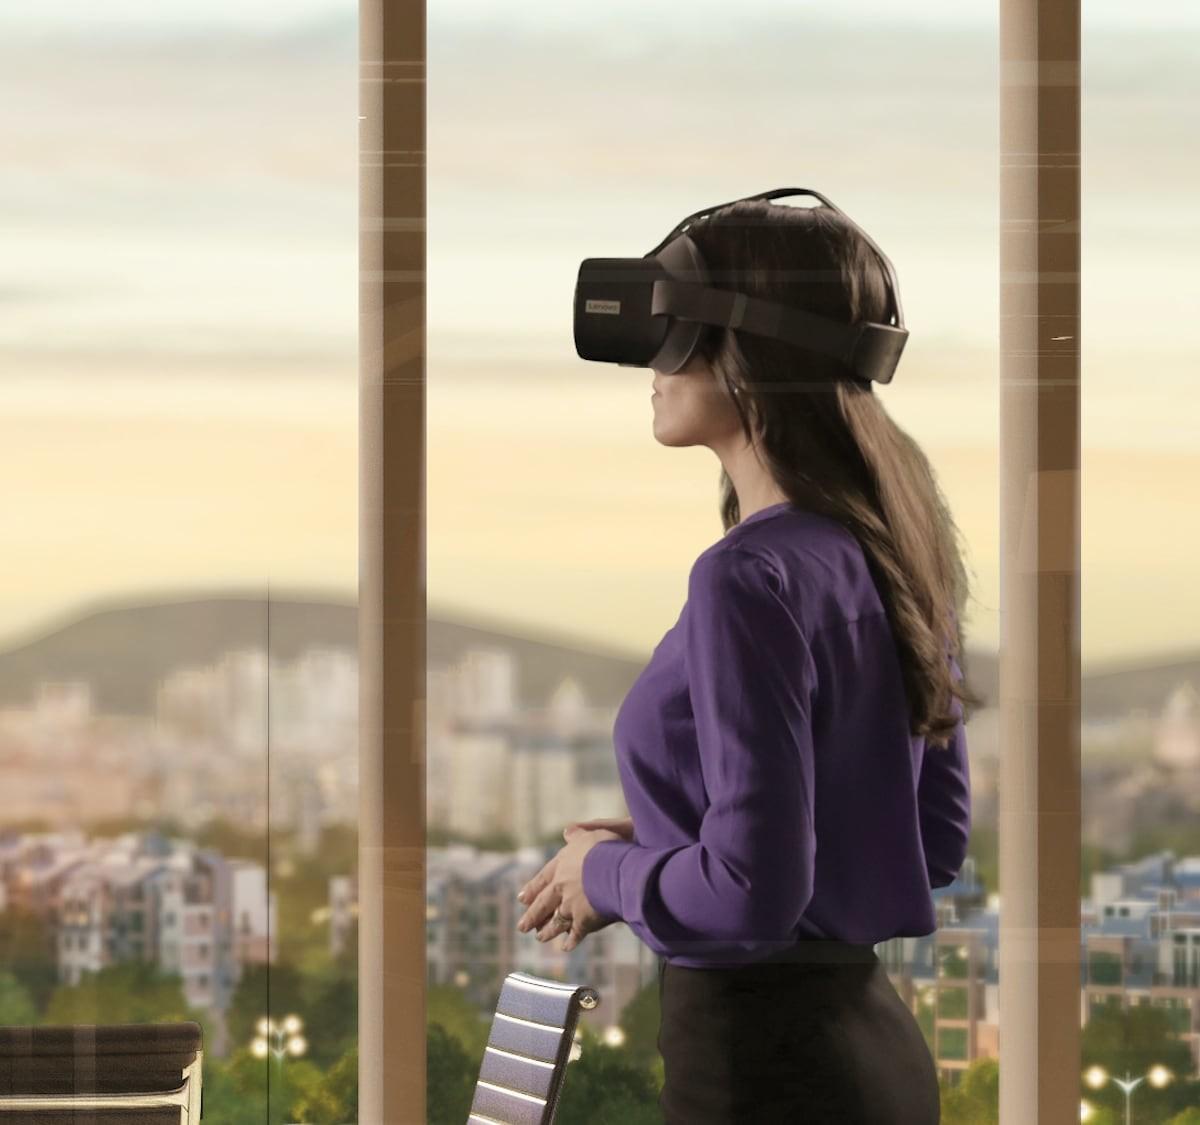 Lenovo Mirage VR S3 Standalone Headset employs ThinkReality for enterprise use